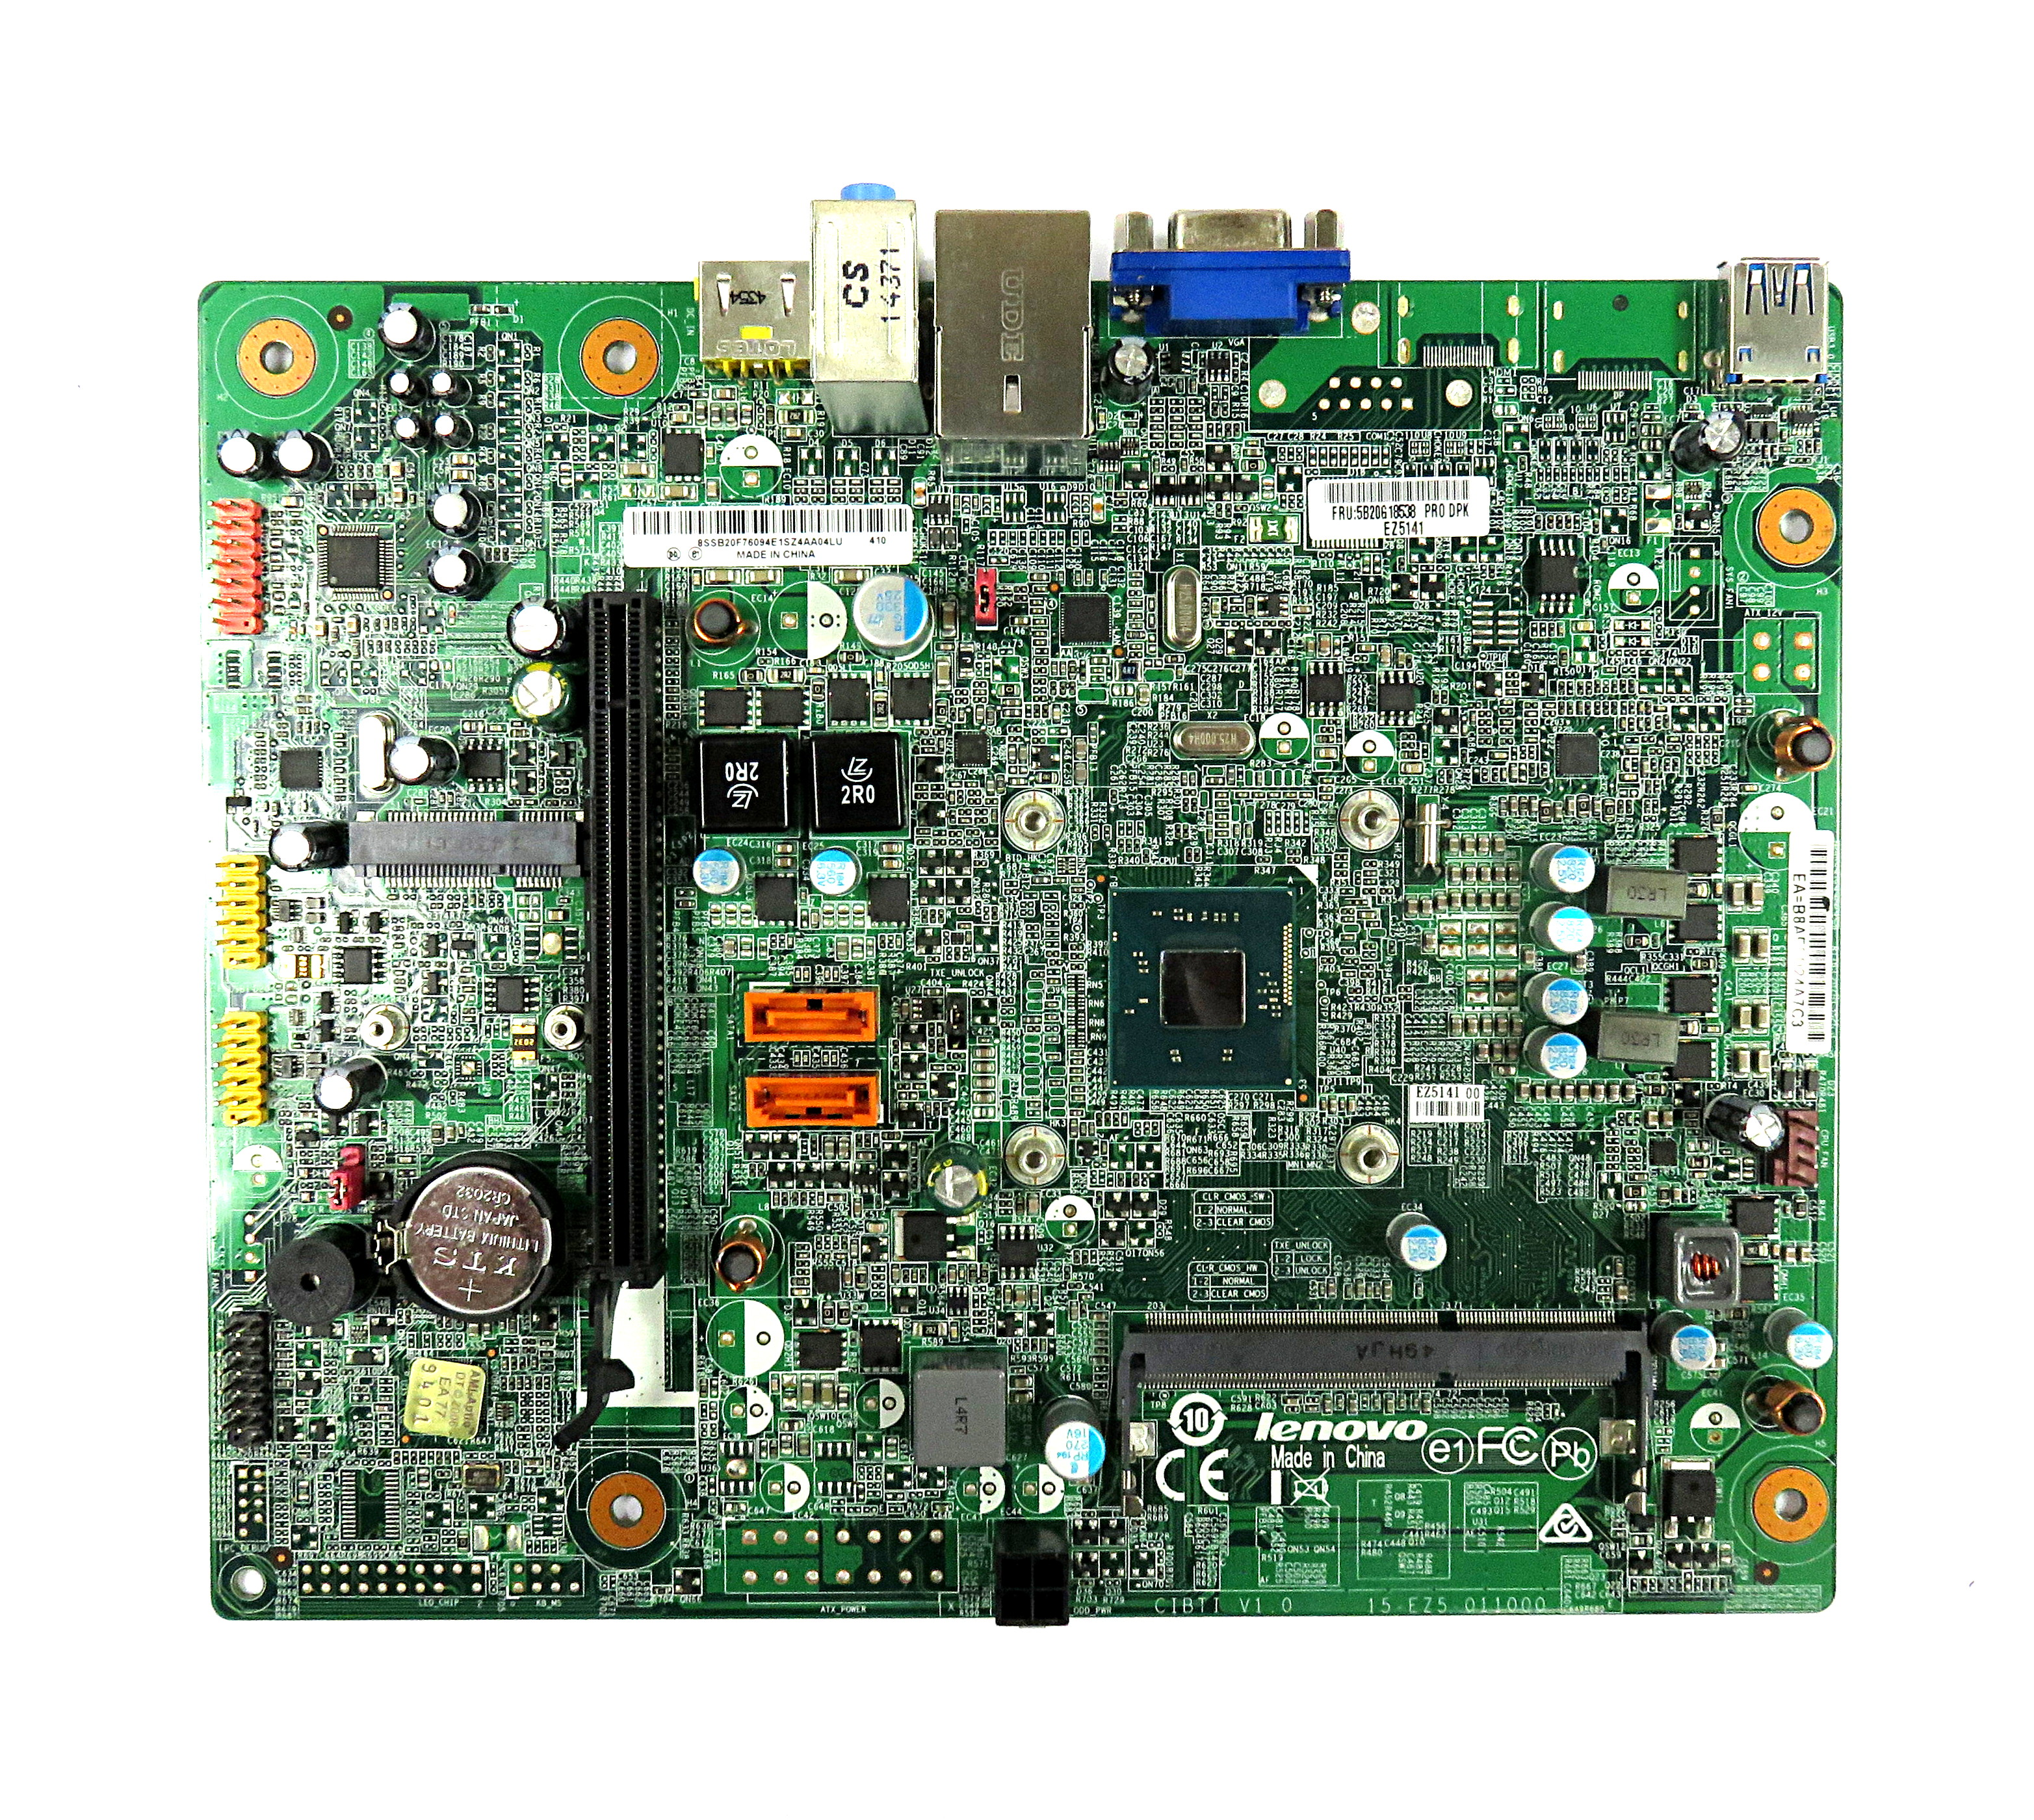 Lenovo 5B20G18538 CIBTI V1.0 BTDD-LT V1.0 Motherboard w/ Intel Celeron J1800 CPU